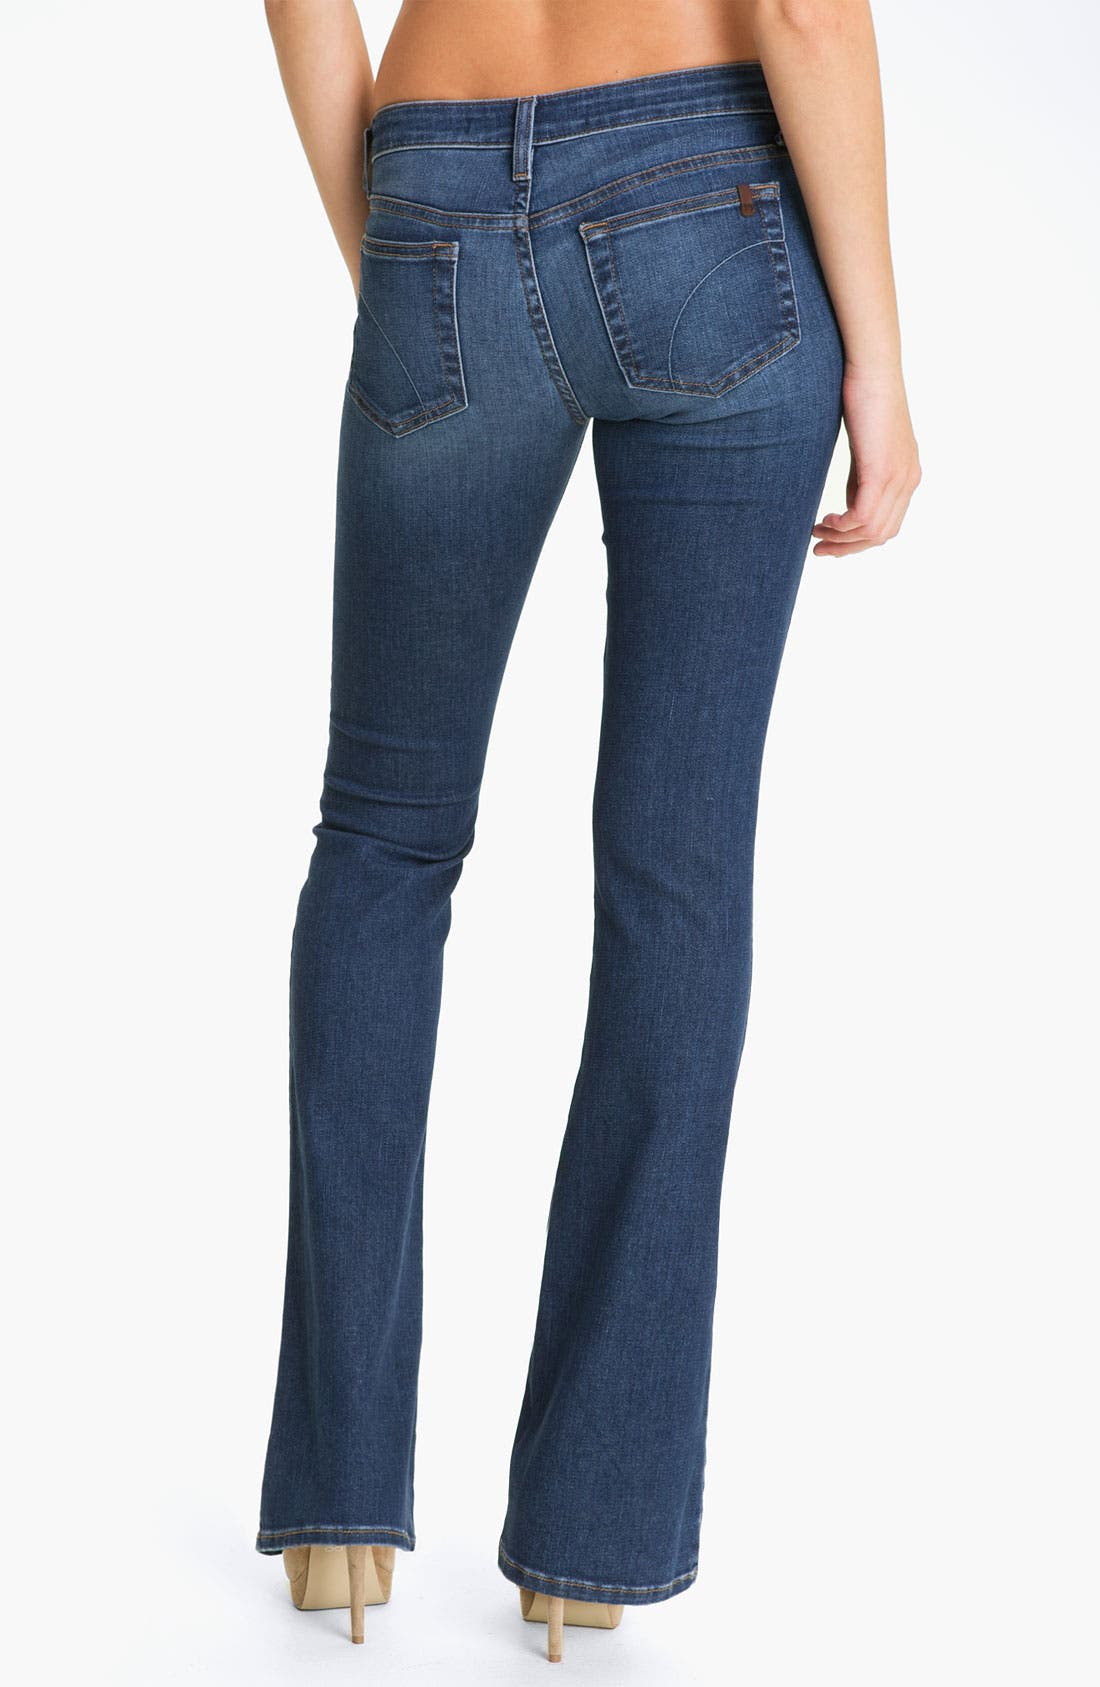 Alternate Image 2  - Joe's 'Honey' Curvy Fit Bootcut Jeans (Angialee)